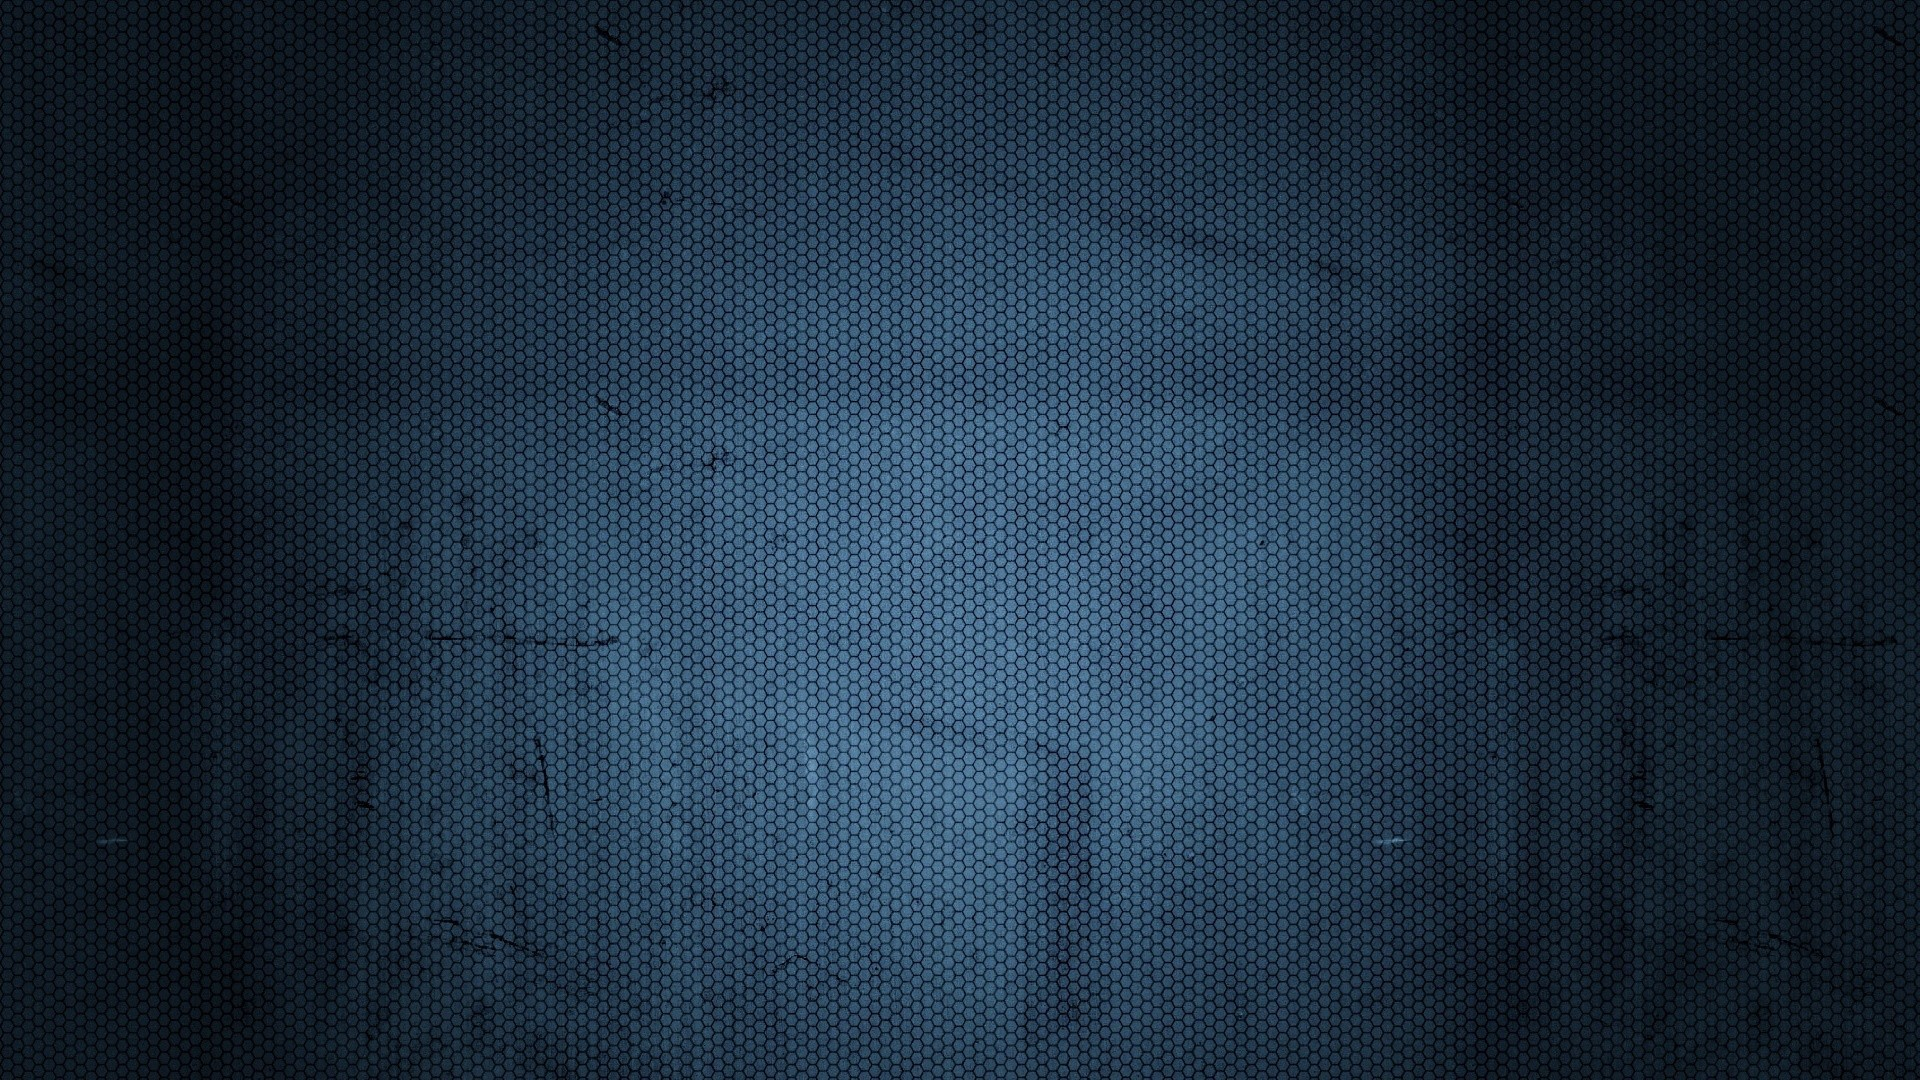 Dark Blue Wallpapers Top Free Dark Blue Backgrounds